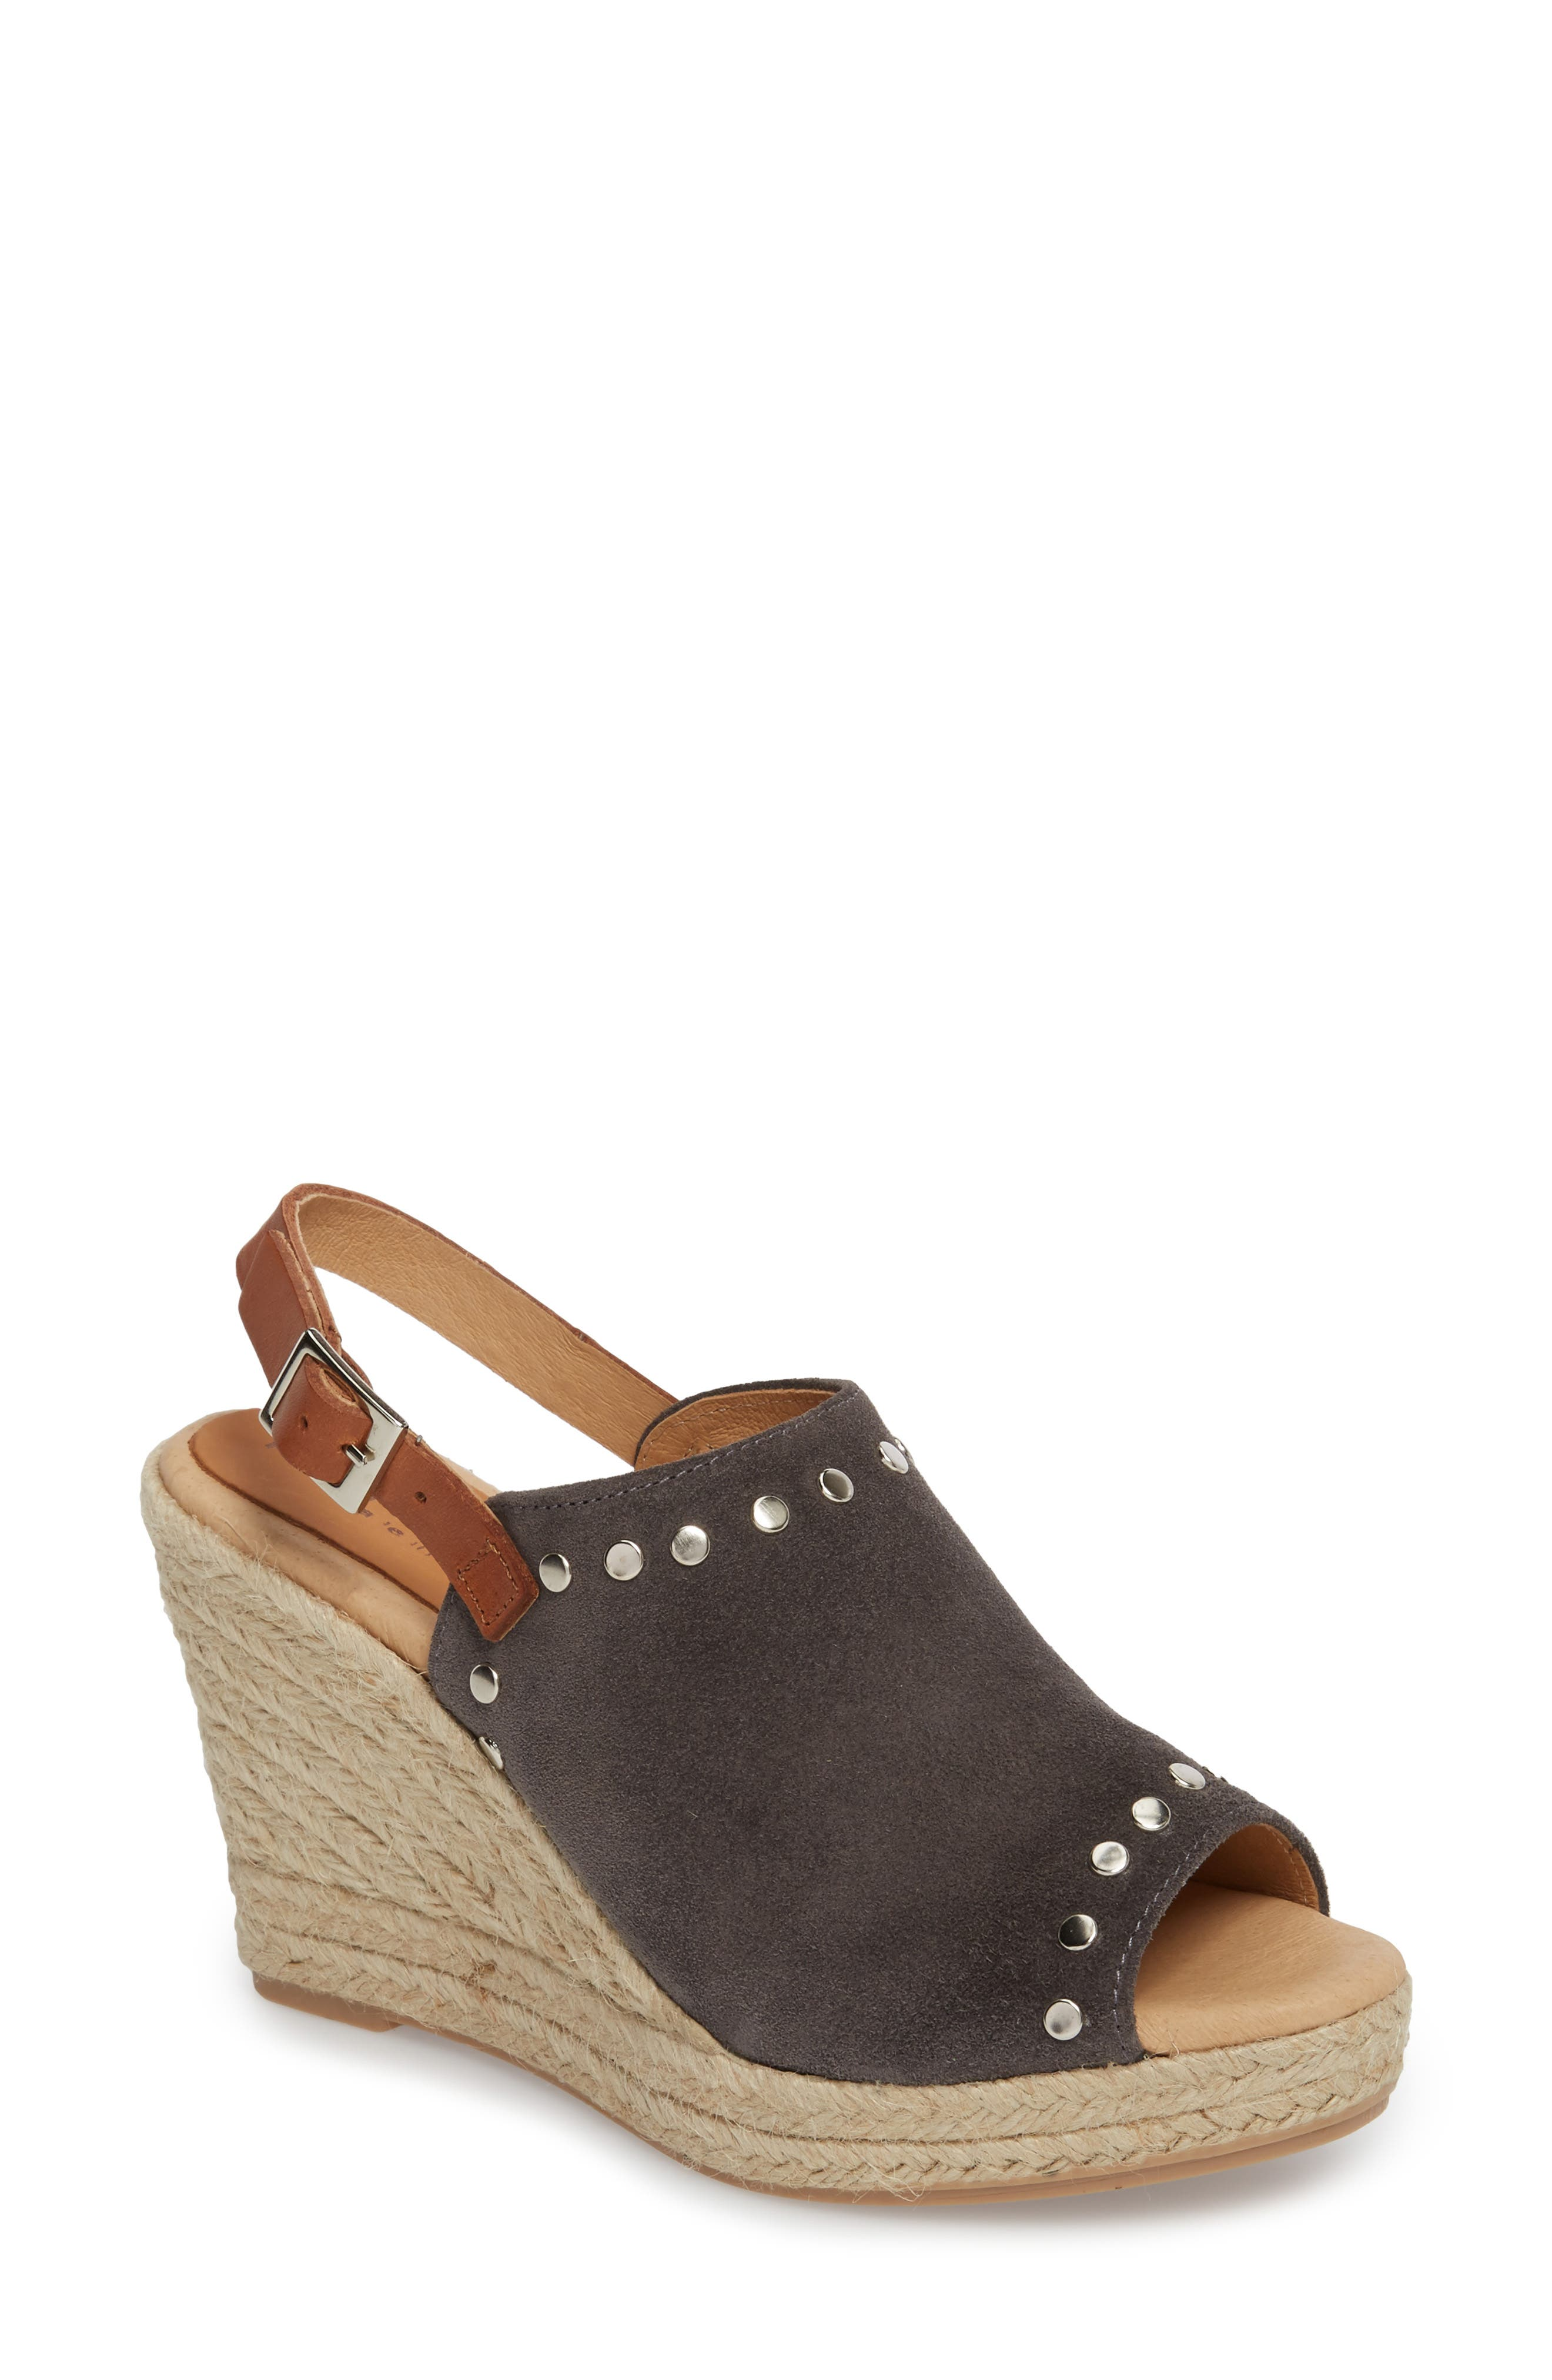 Patricia Green Rockstar Espadrille Wedge Sandal